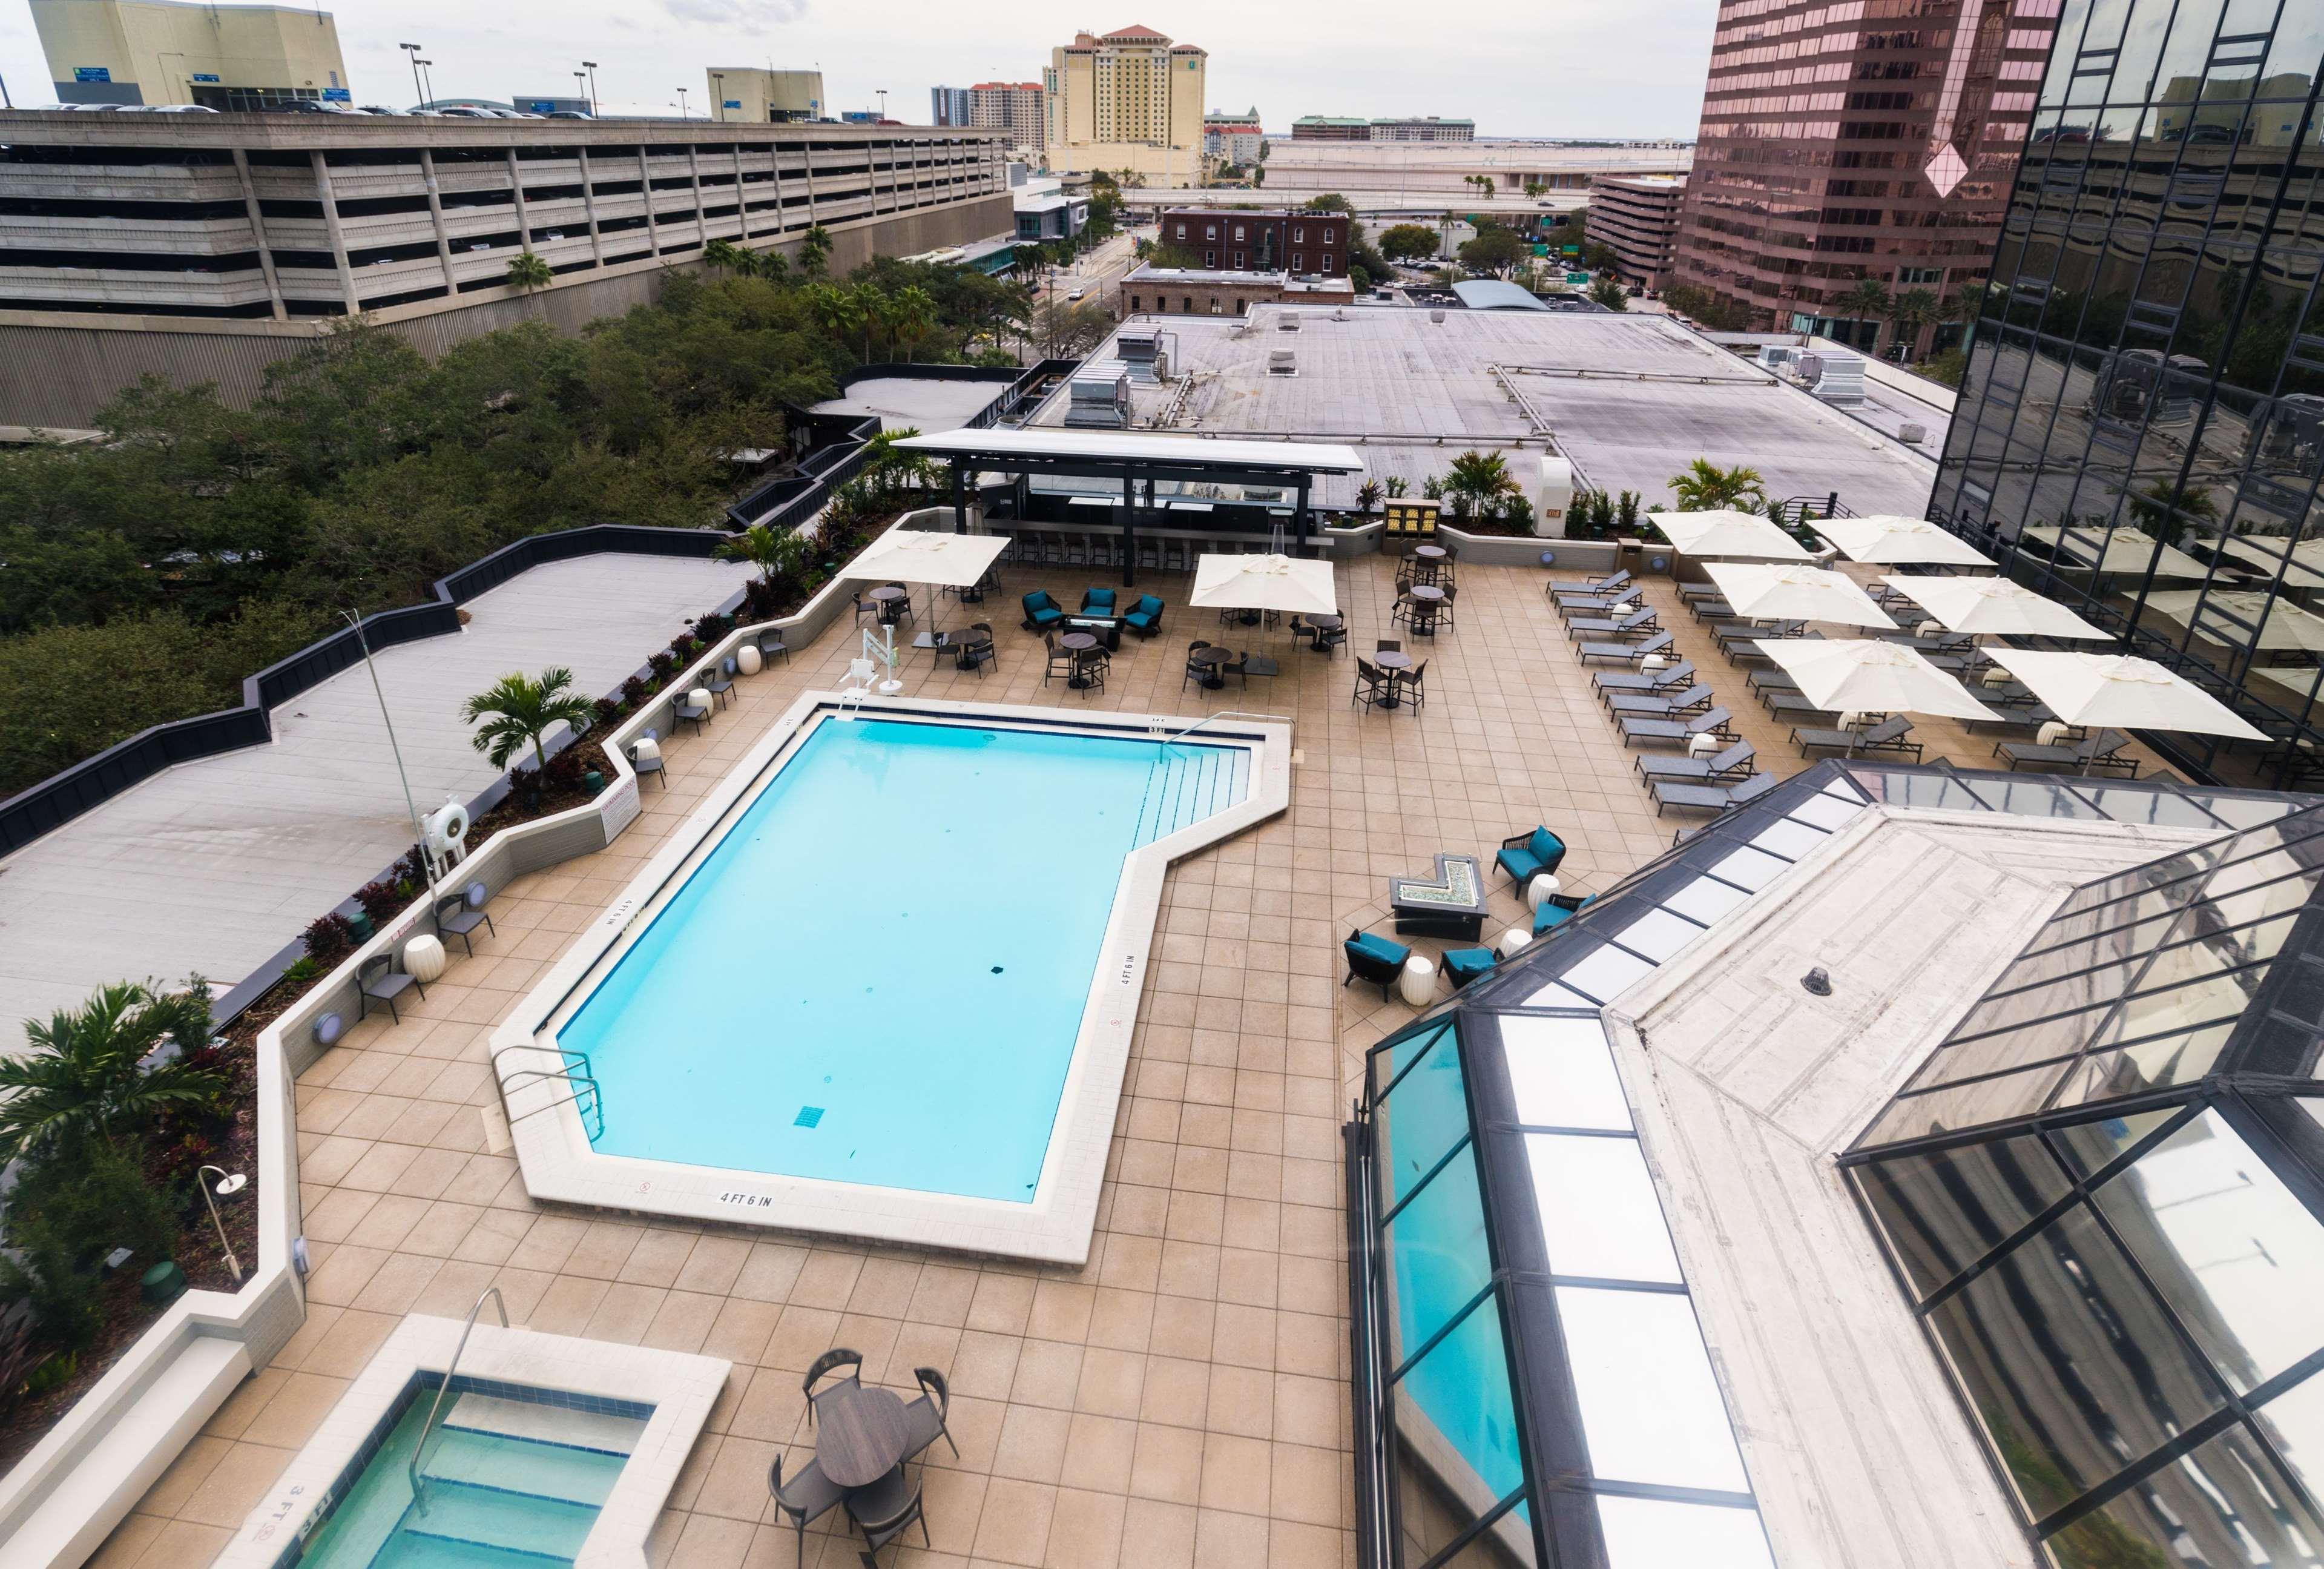 Hilton Tampa Downtown image 9